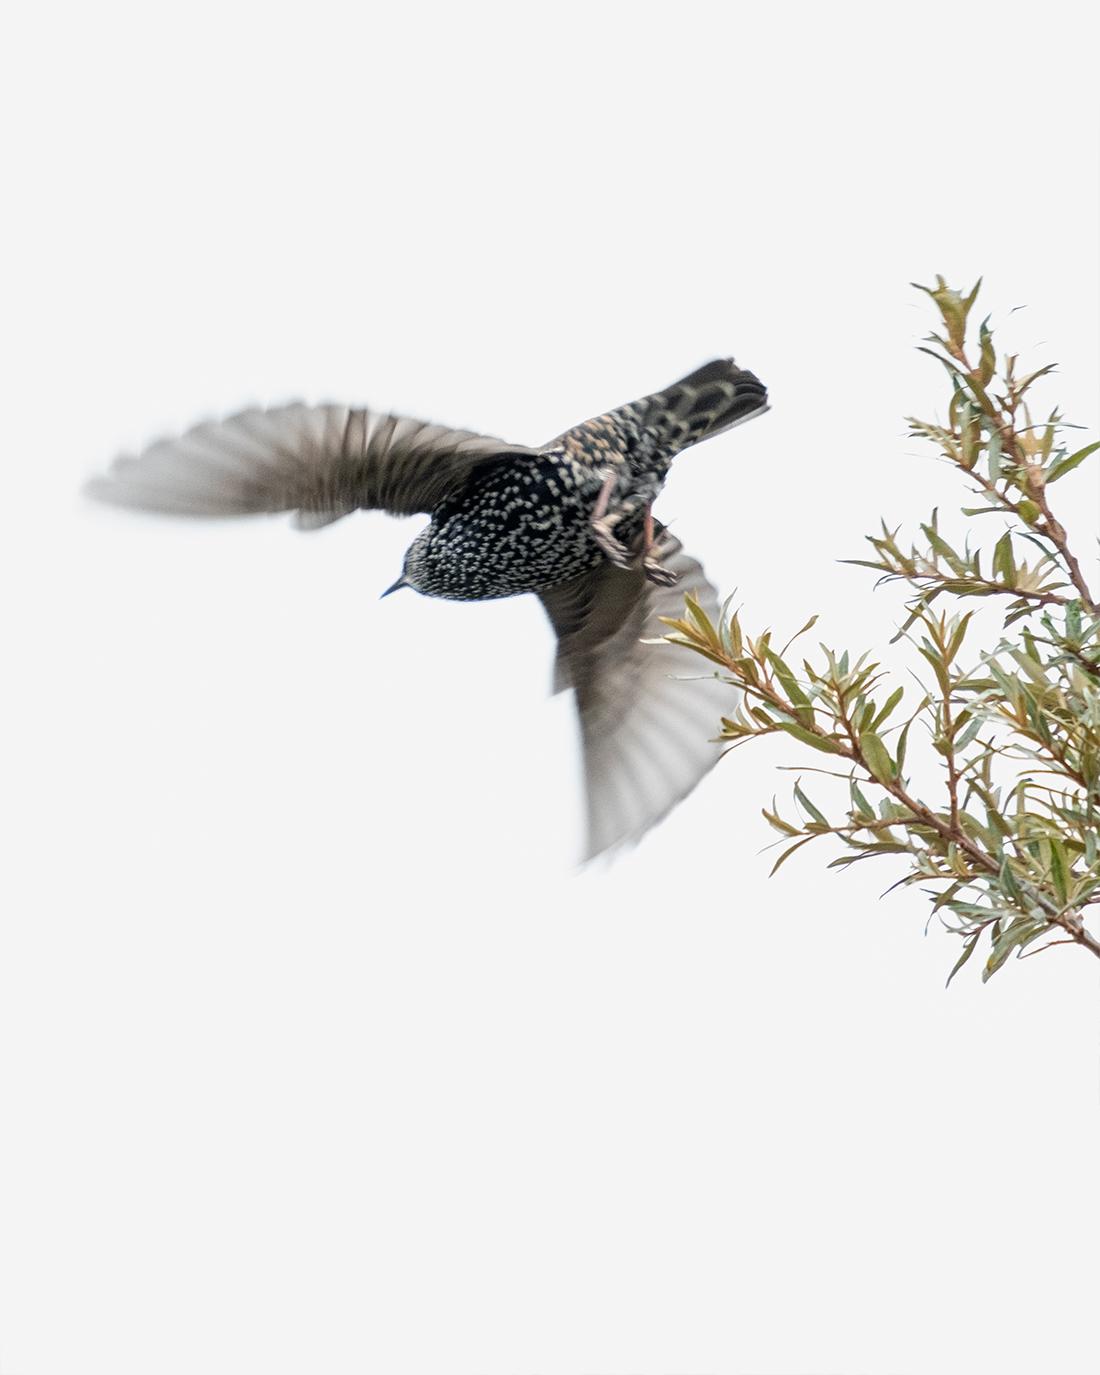 DSCF3062-1-WEB-2-stær-fuglefoto-trondheim-kunstfoto-cecilie-jystad